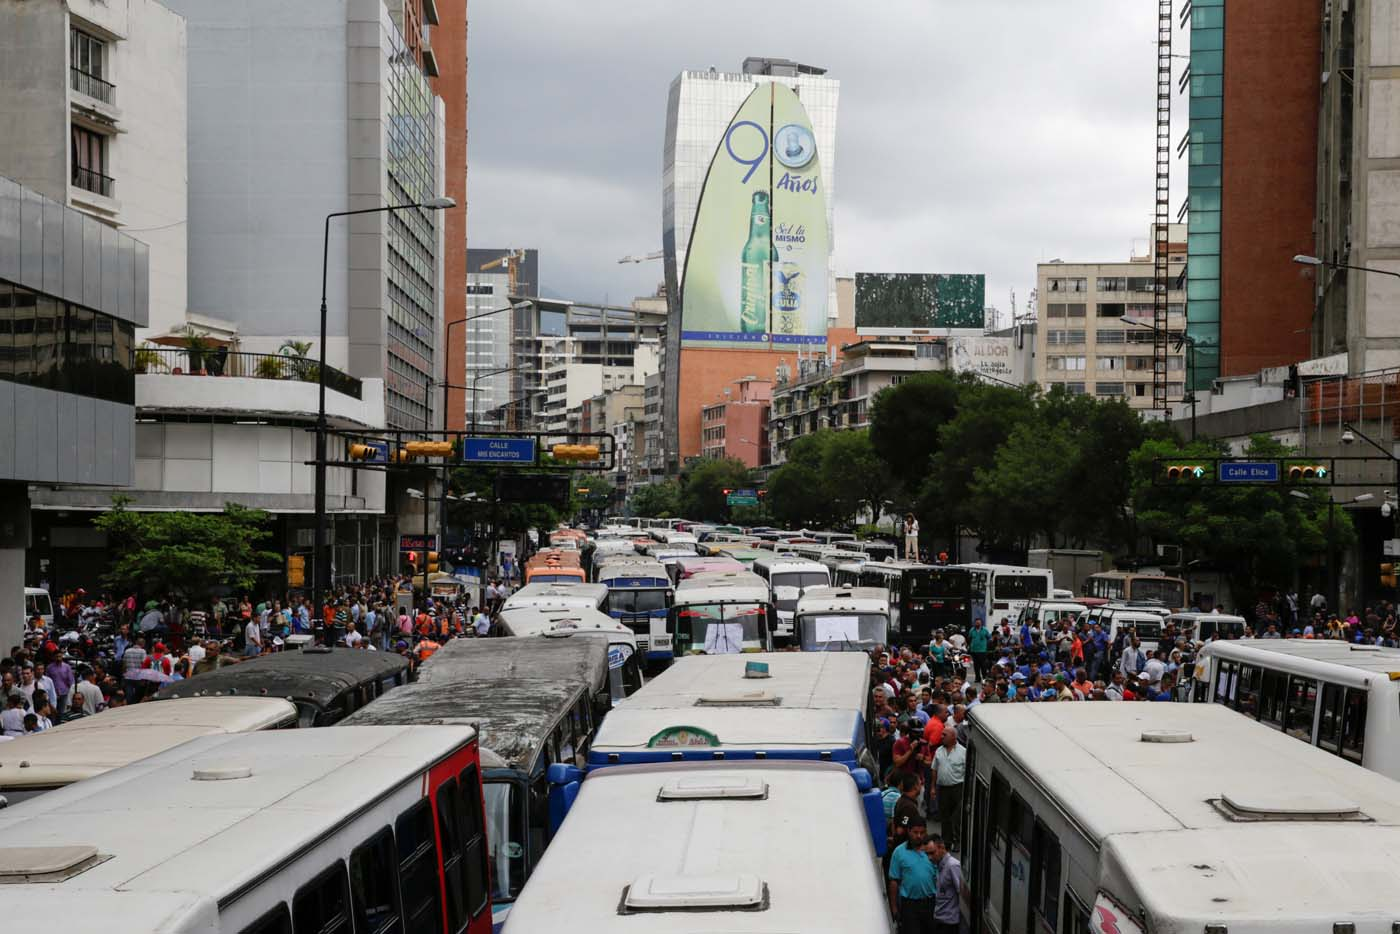 2016-09-21T164439Z_312059905_S1BEUCPLYDAB_RTRMADP_3_VENEZUELA-POLITICS